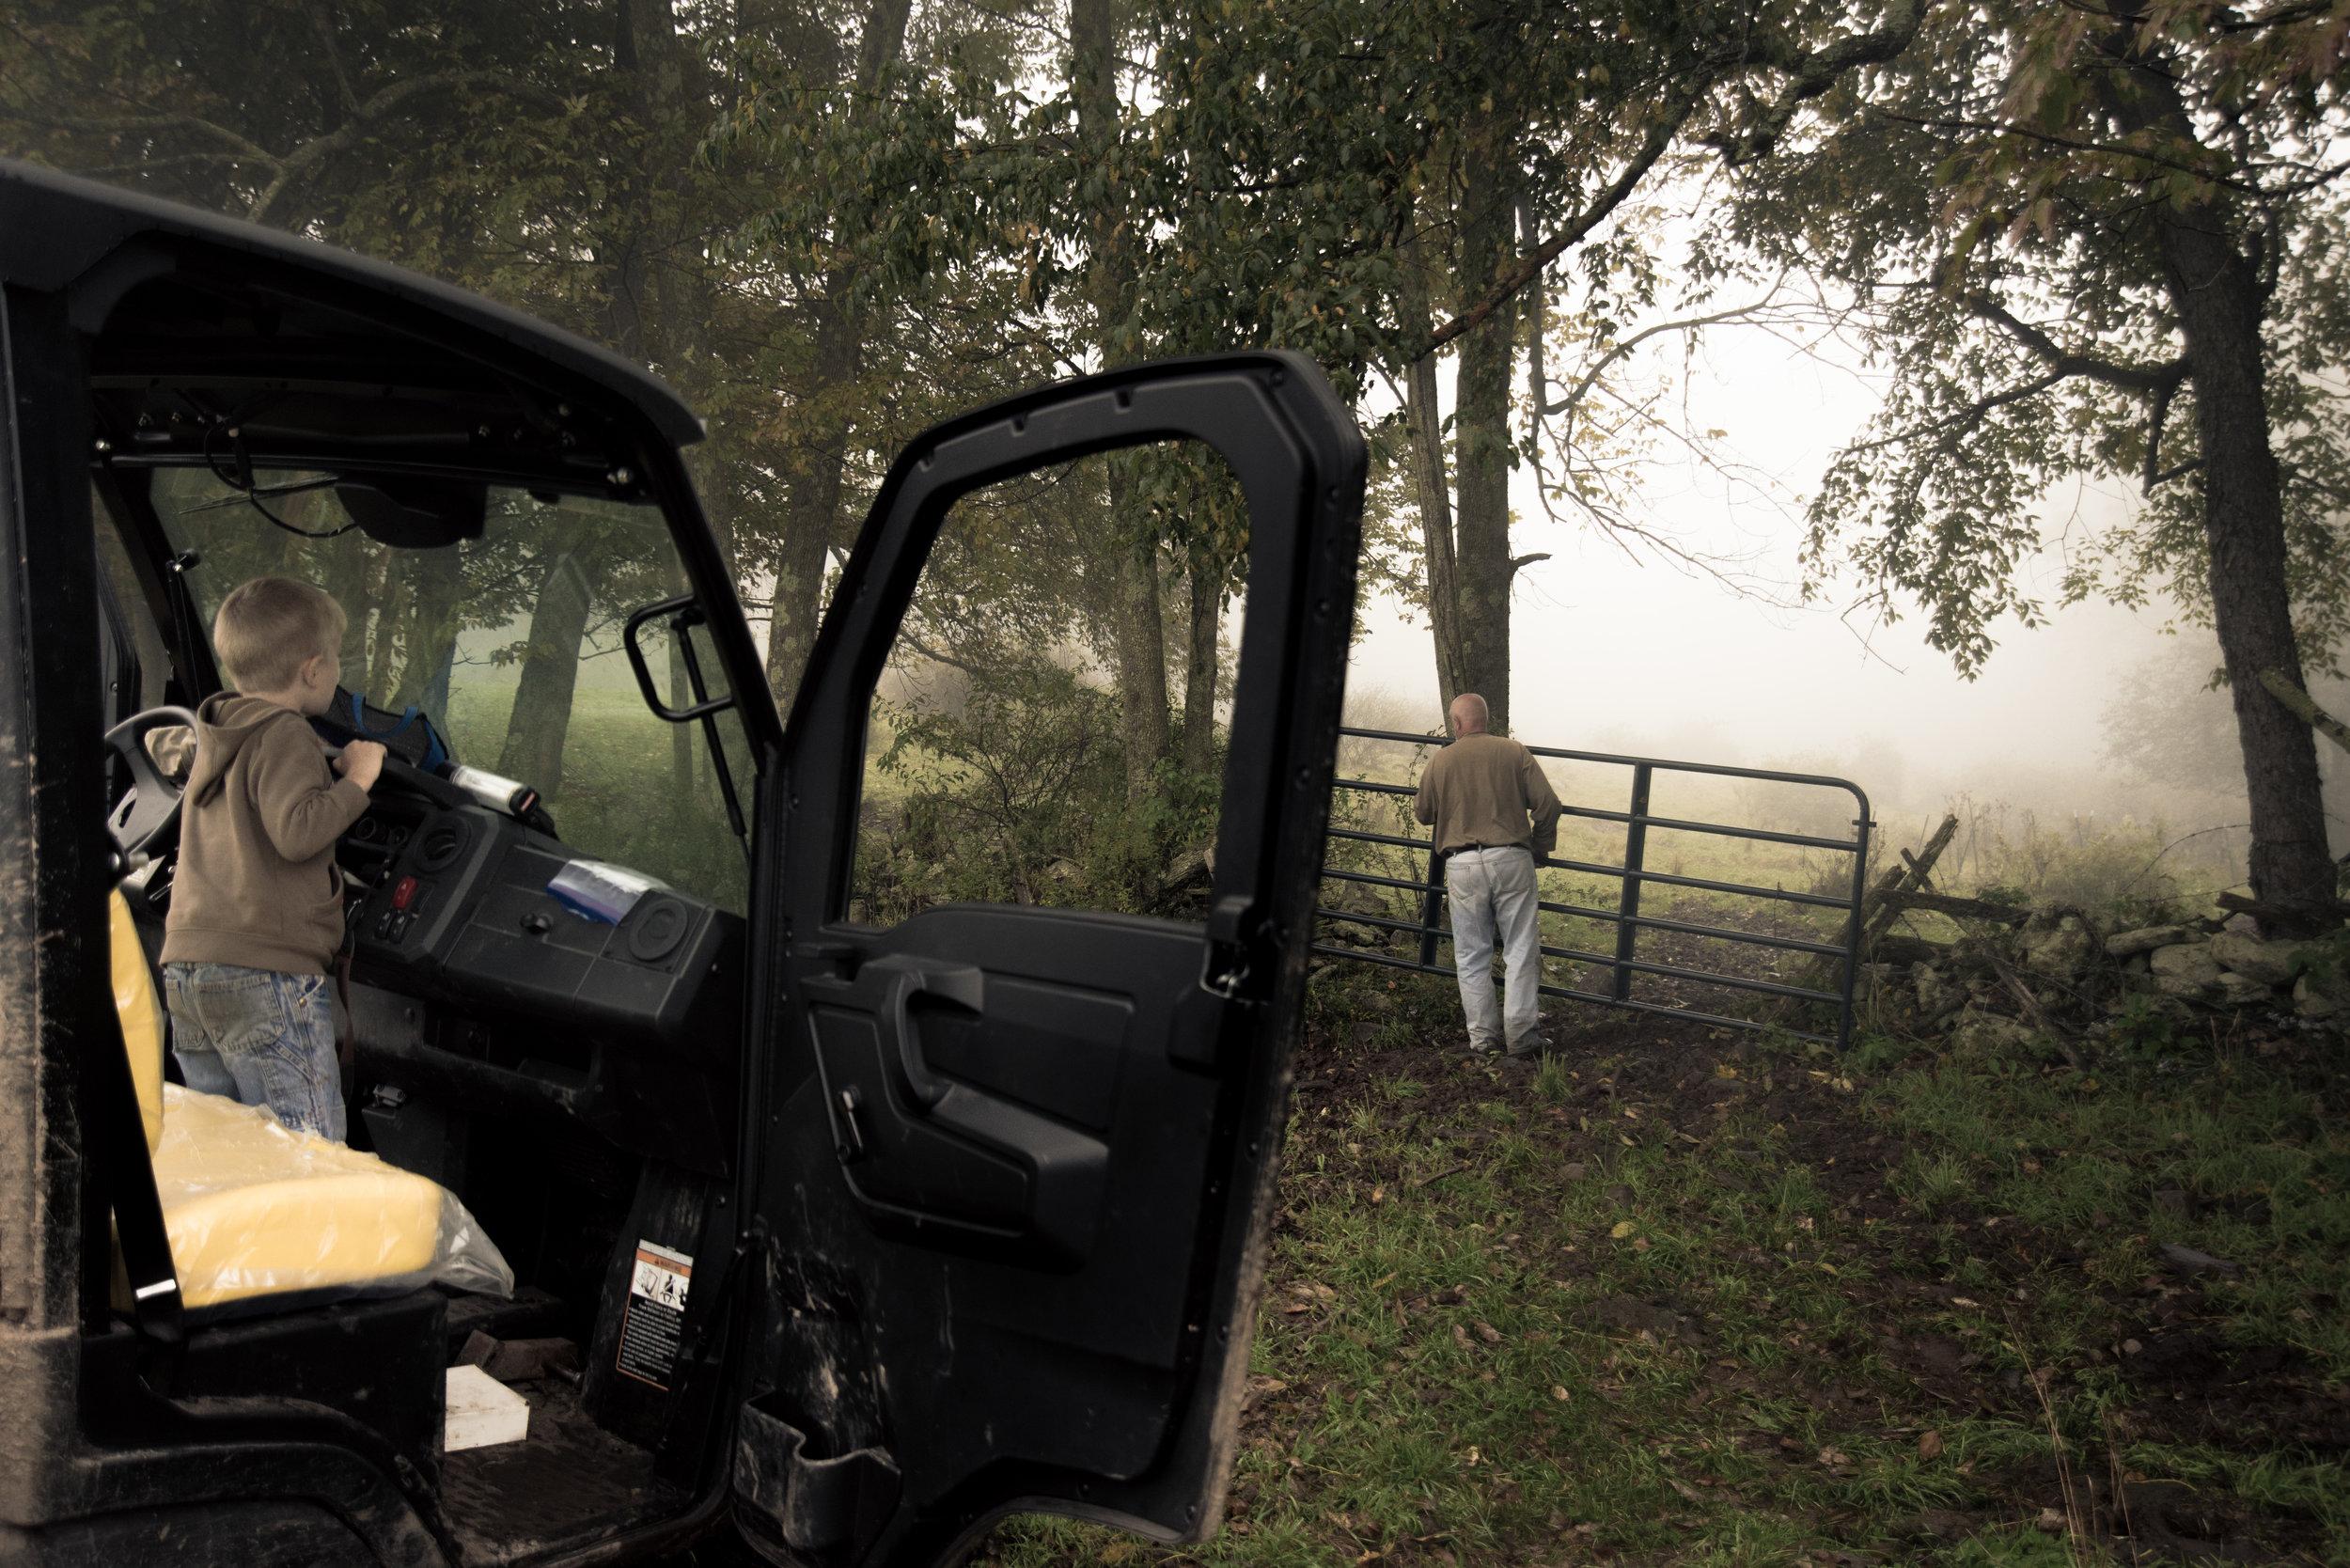 Sharon_Joetama_deer_farm-2.jpg